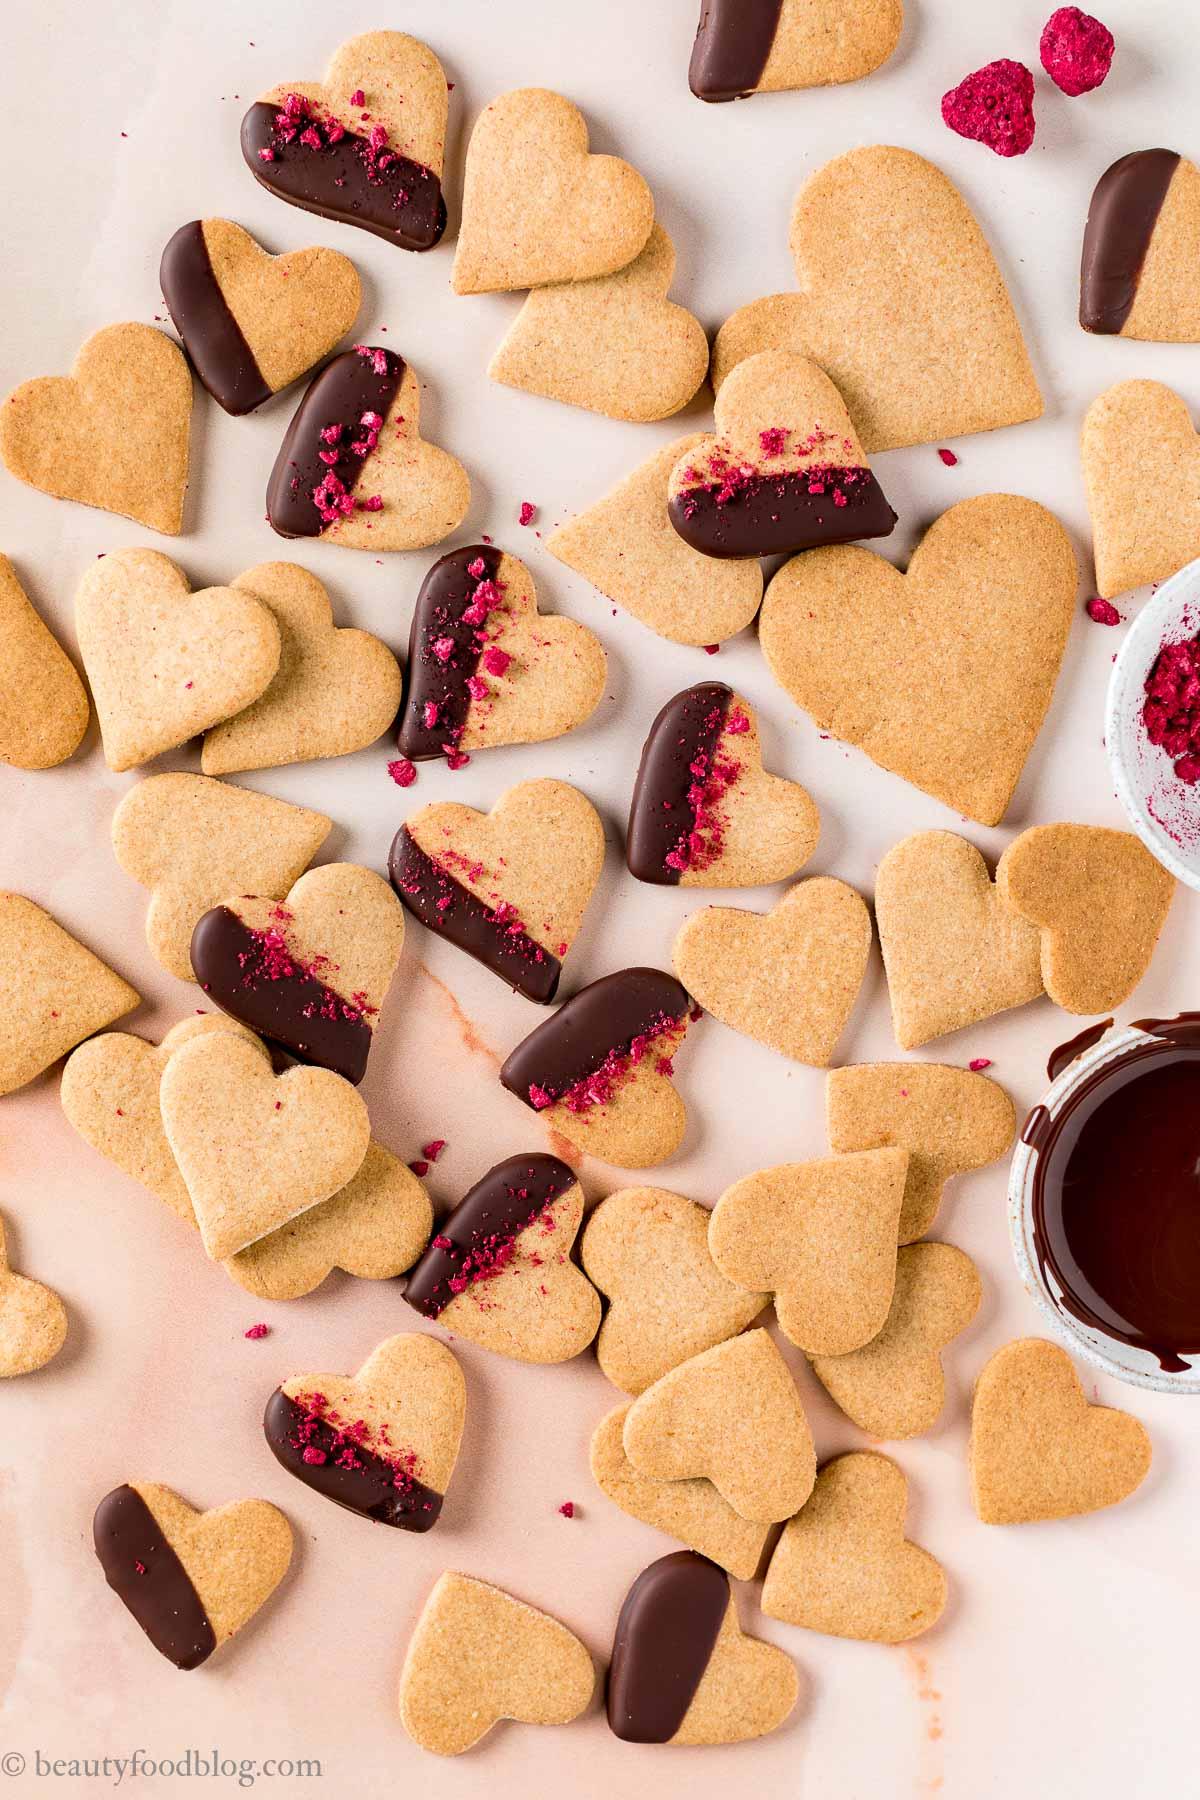 vegan Valentines Day vegan shortbread cookies ricetta biscotti di pasta frolla vegana integrale senza uova senza burro per San Valentino frollini